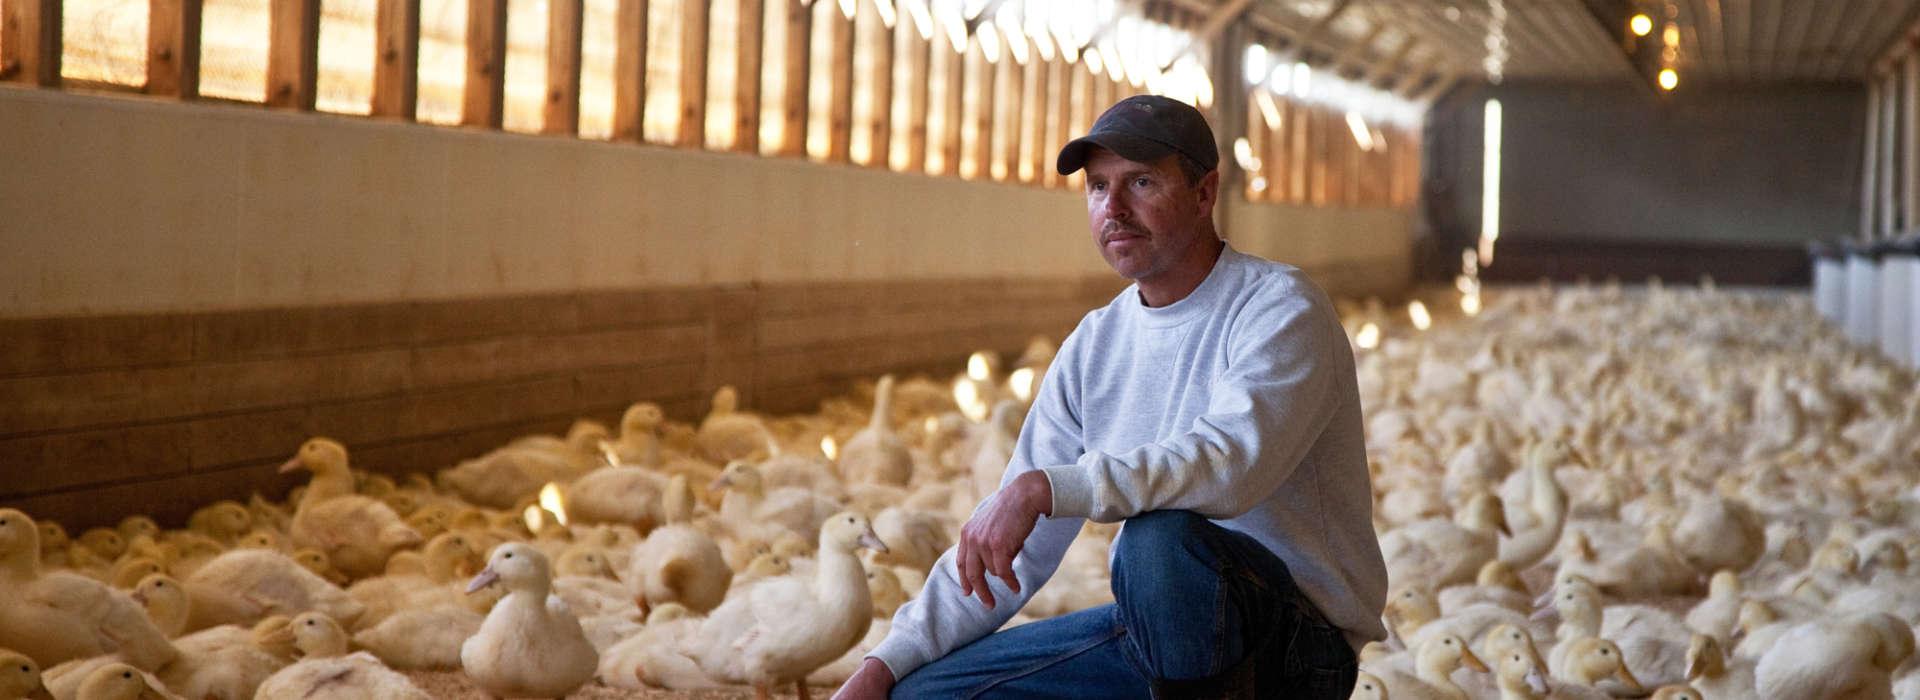 Mike Mast farmer